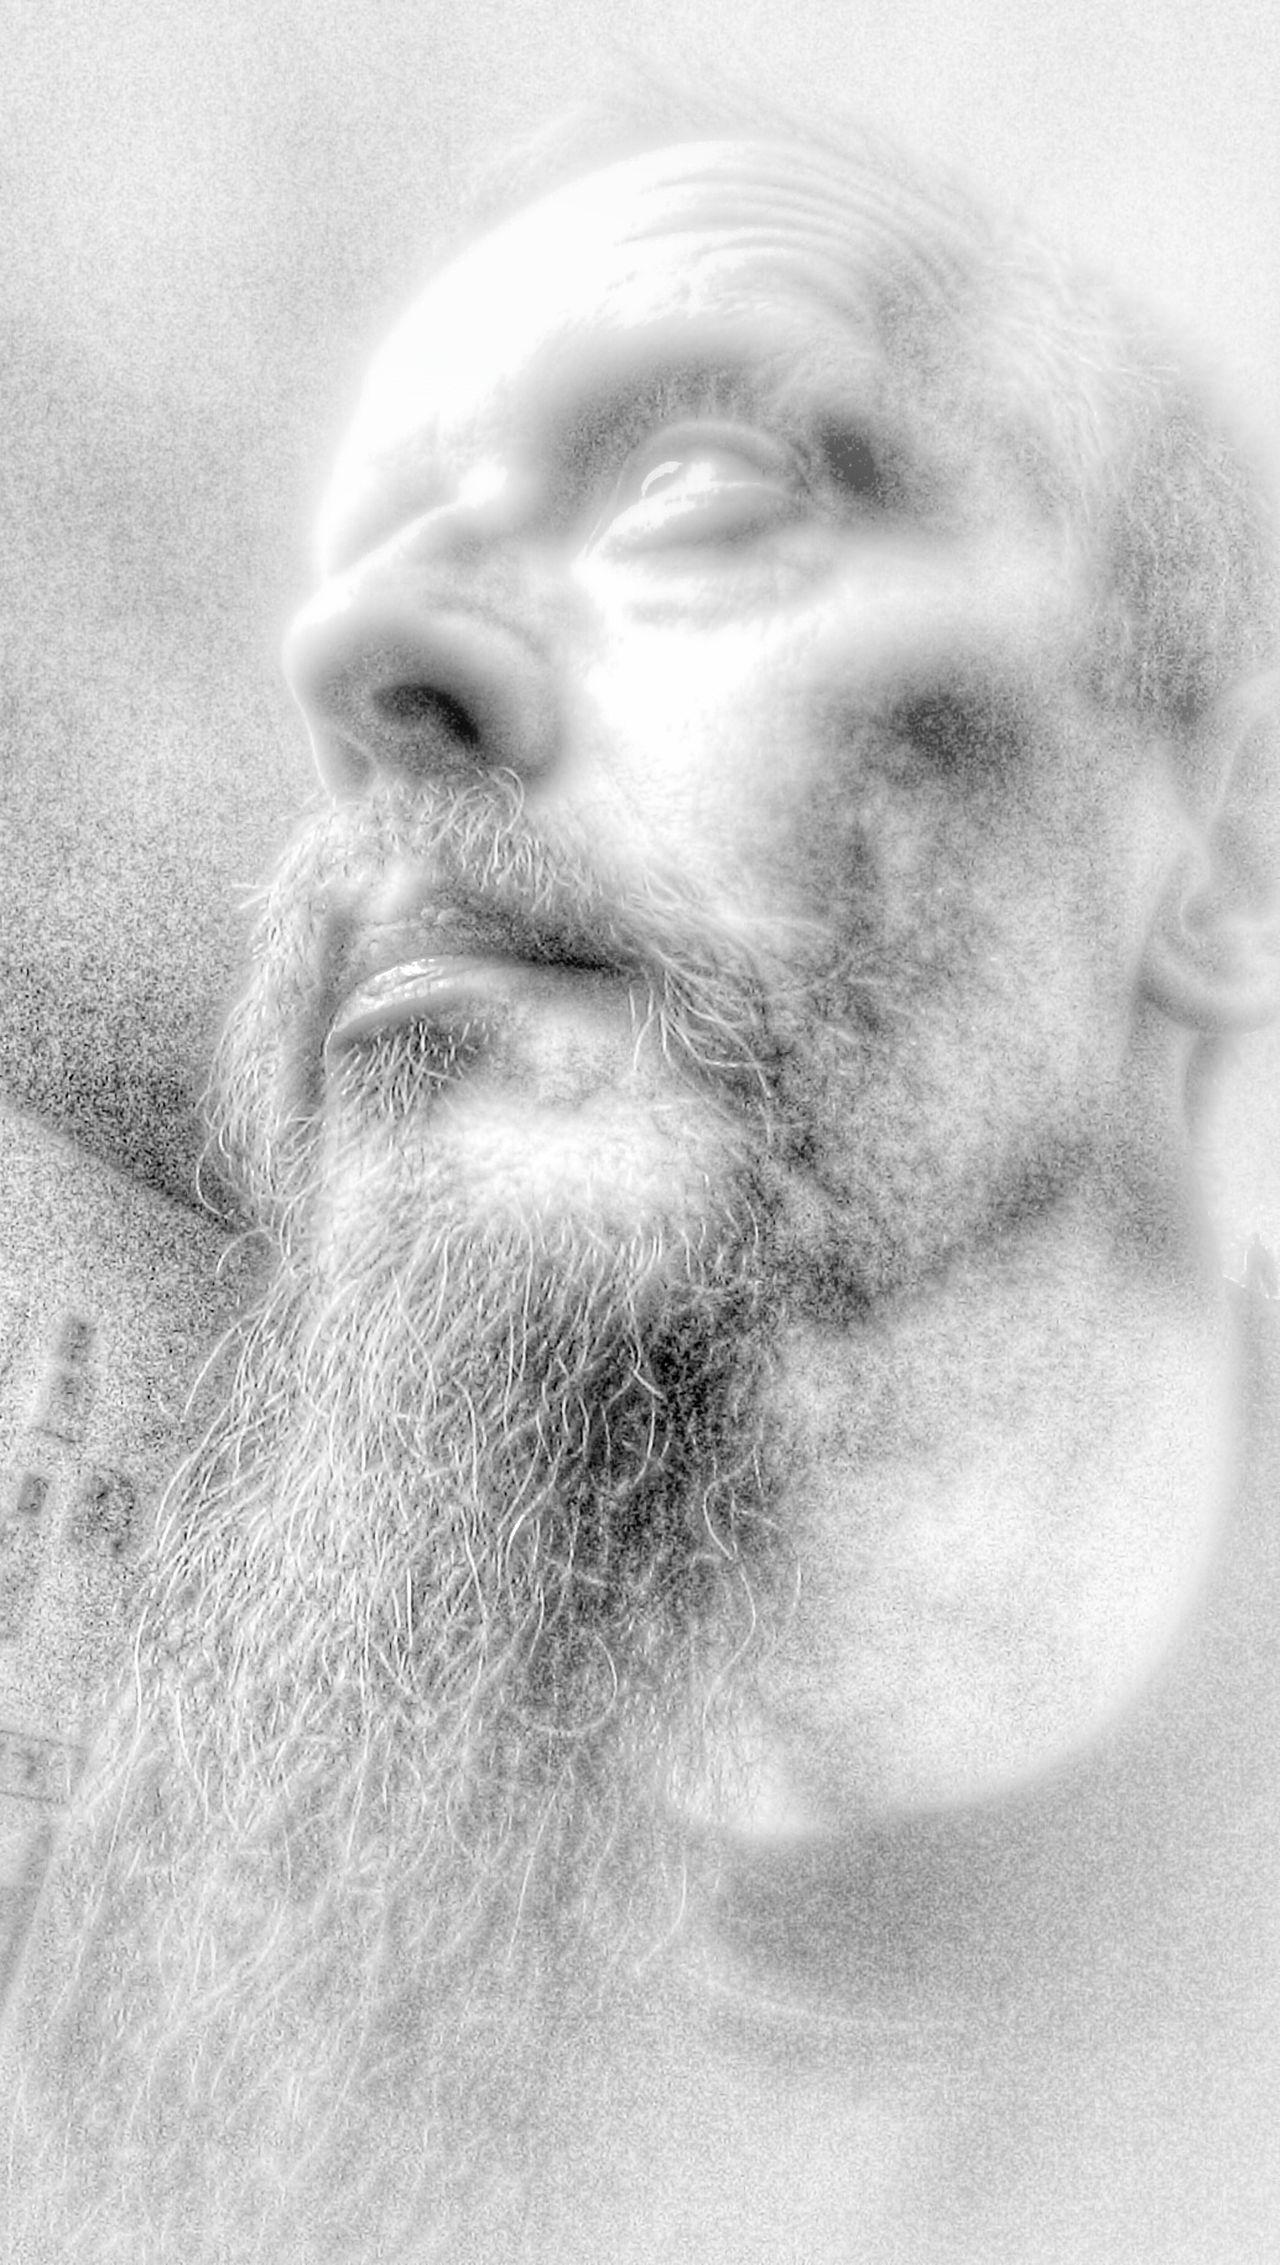 Thats Me  Monochrome Portrait HDR Selfportrait My Beard